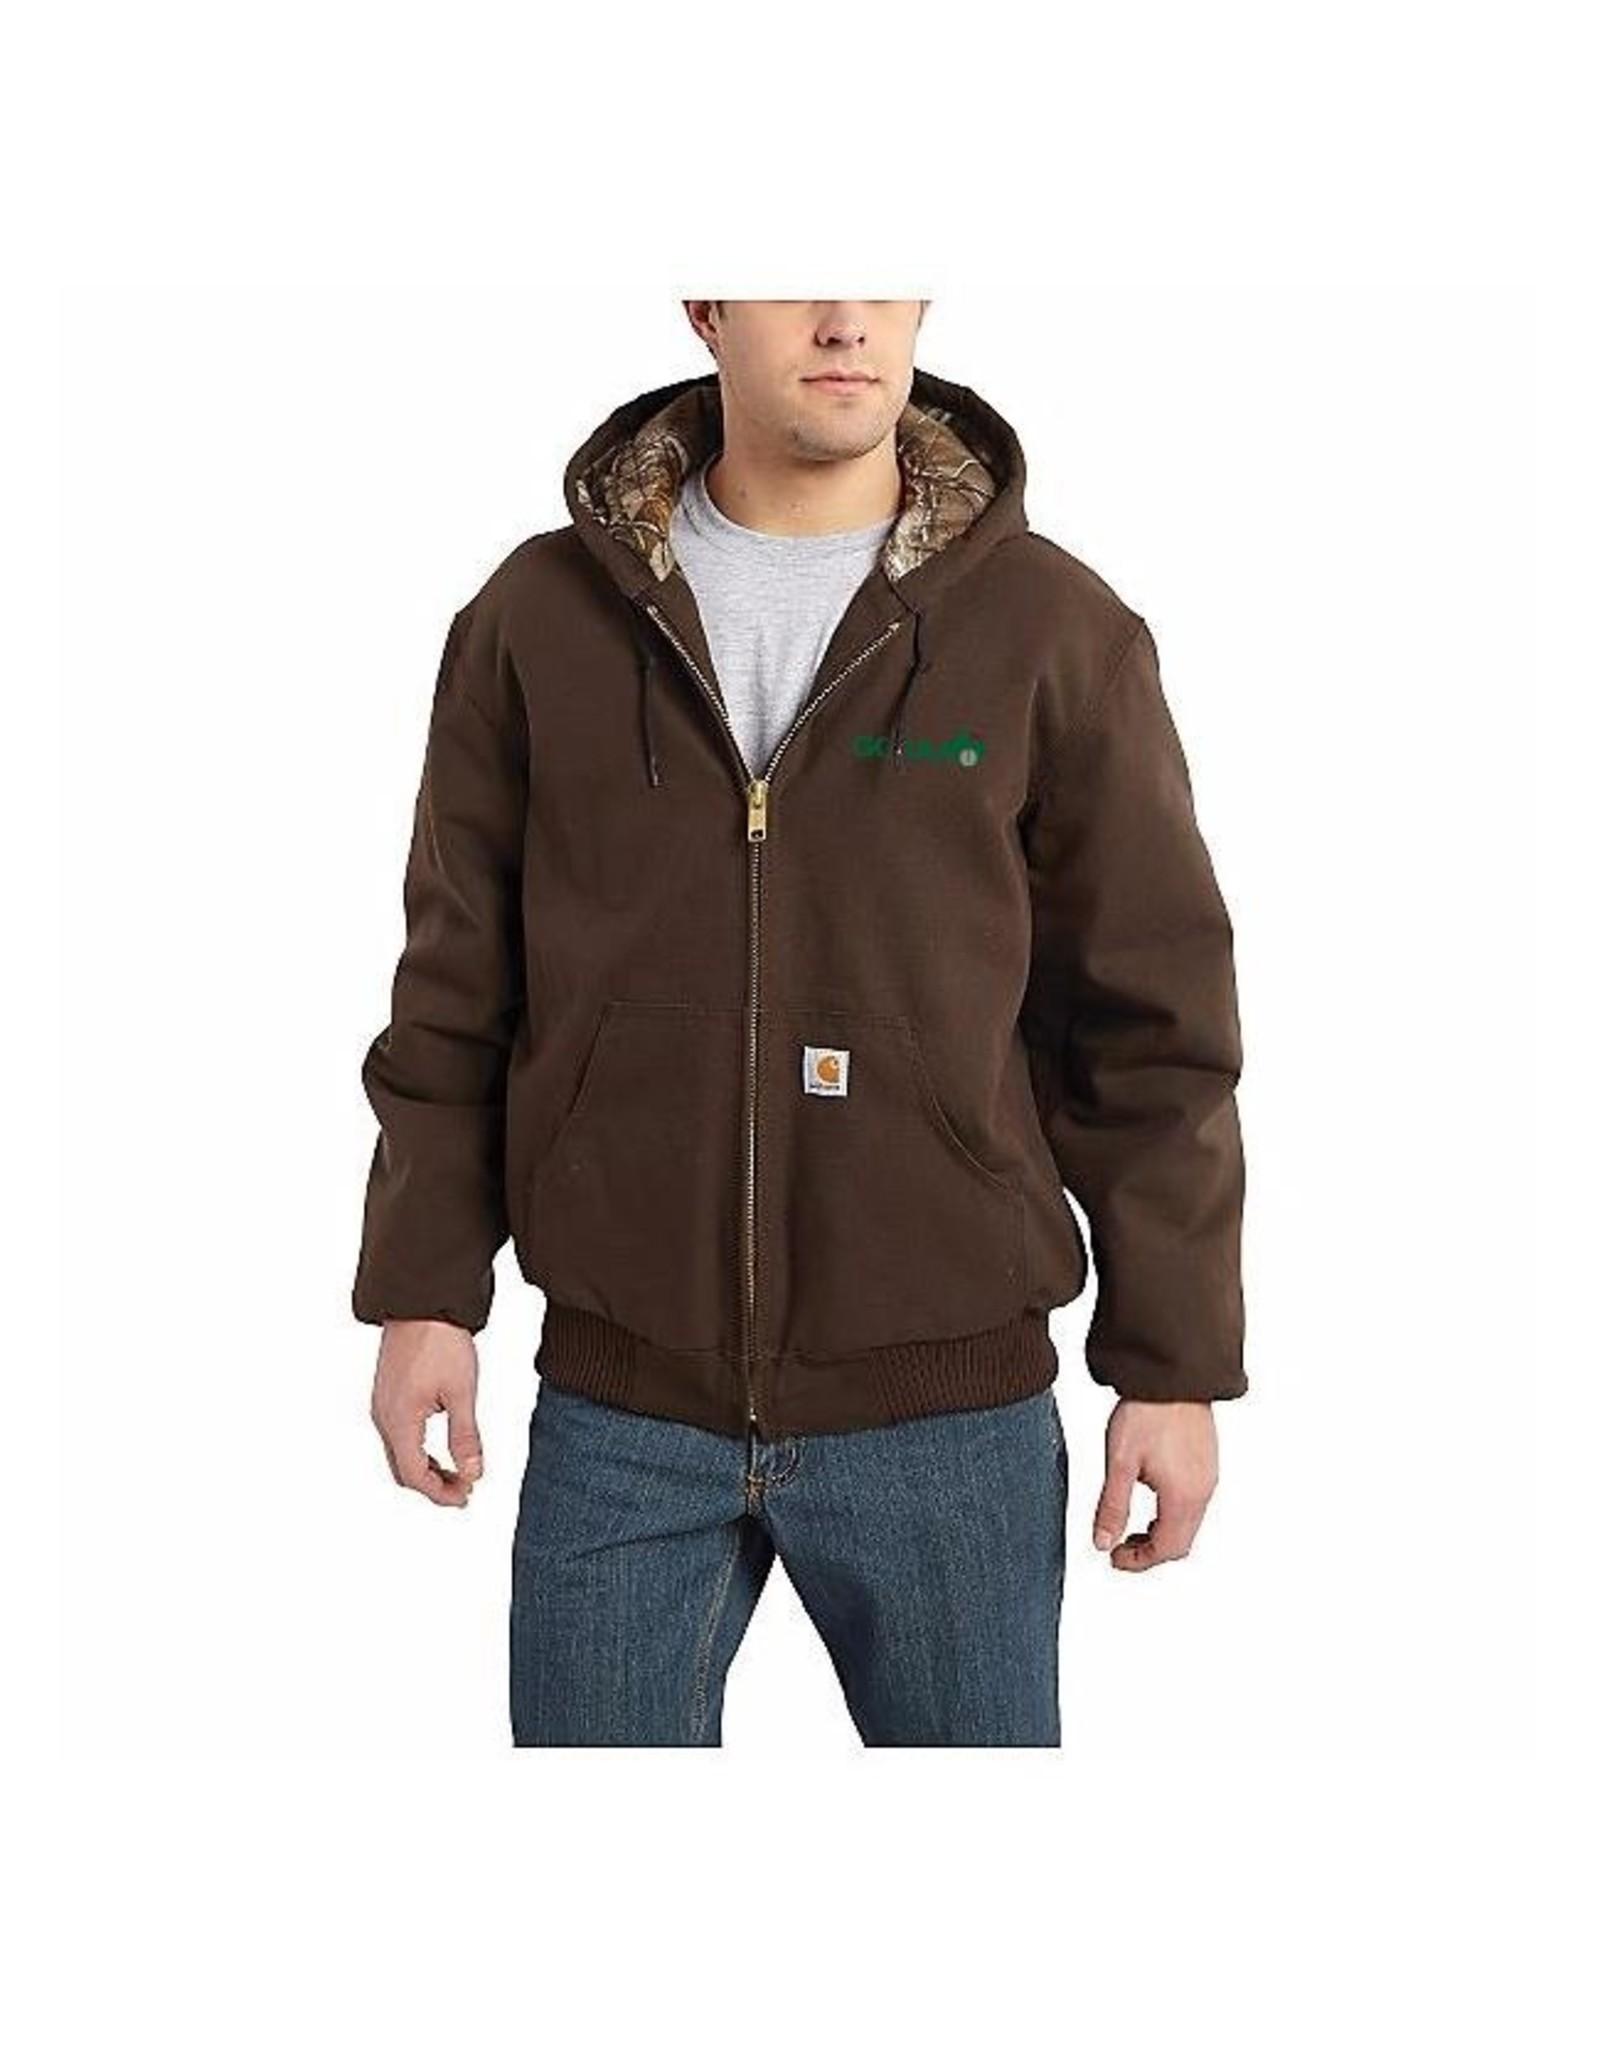 Carhartt Carhartt Hooded Jacket